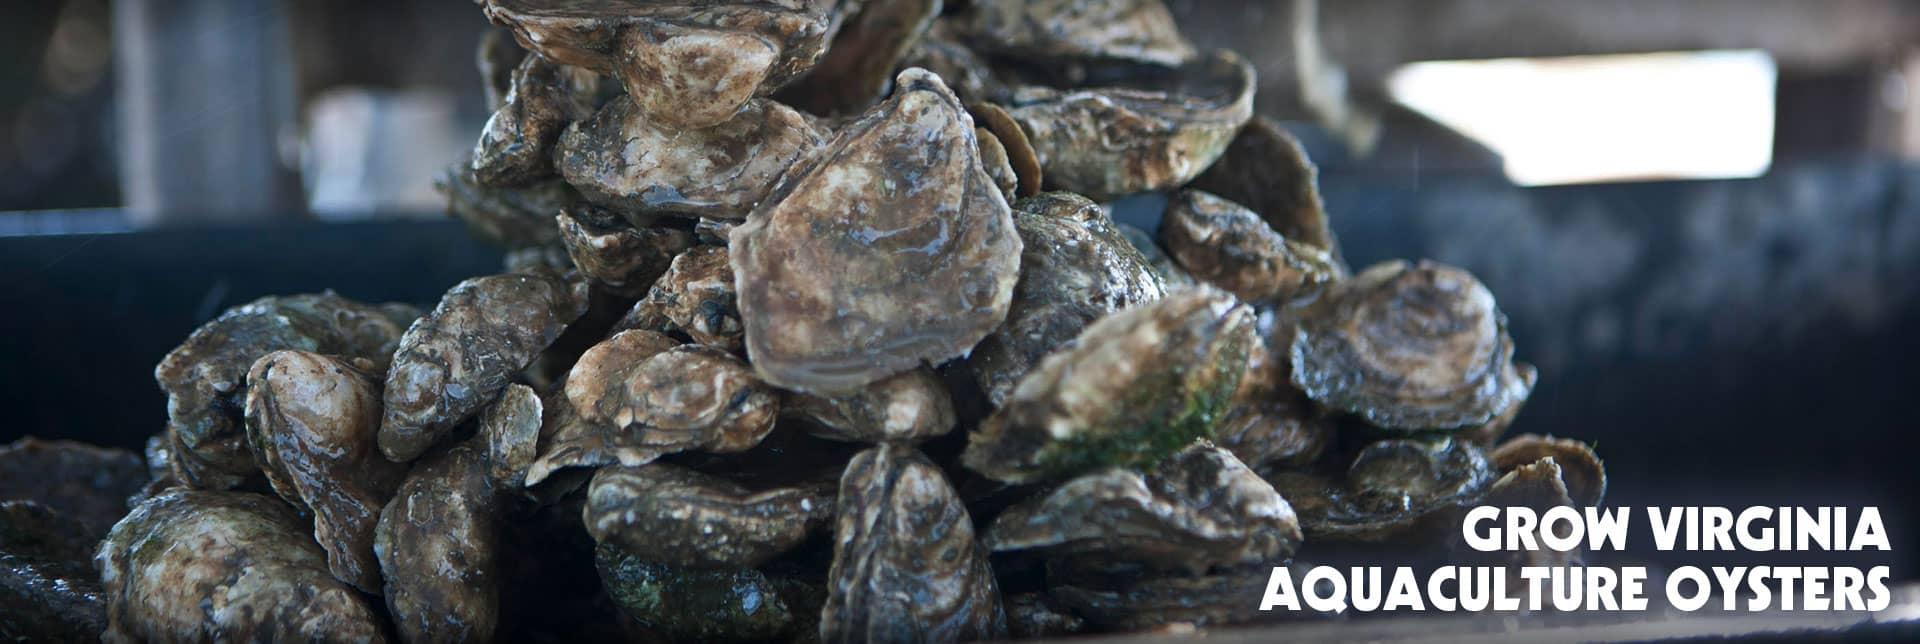 Grow Virginia Aquaculture Oysters